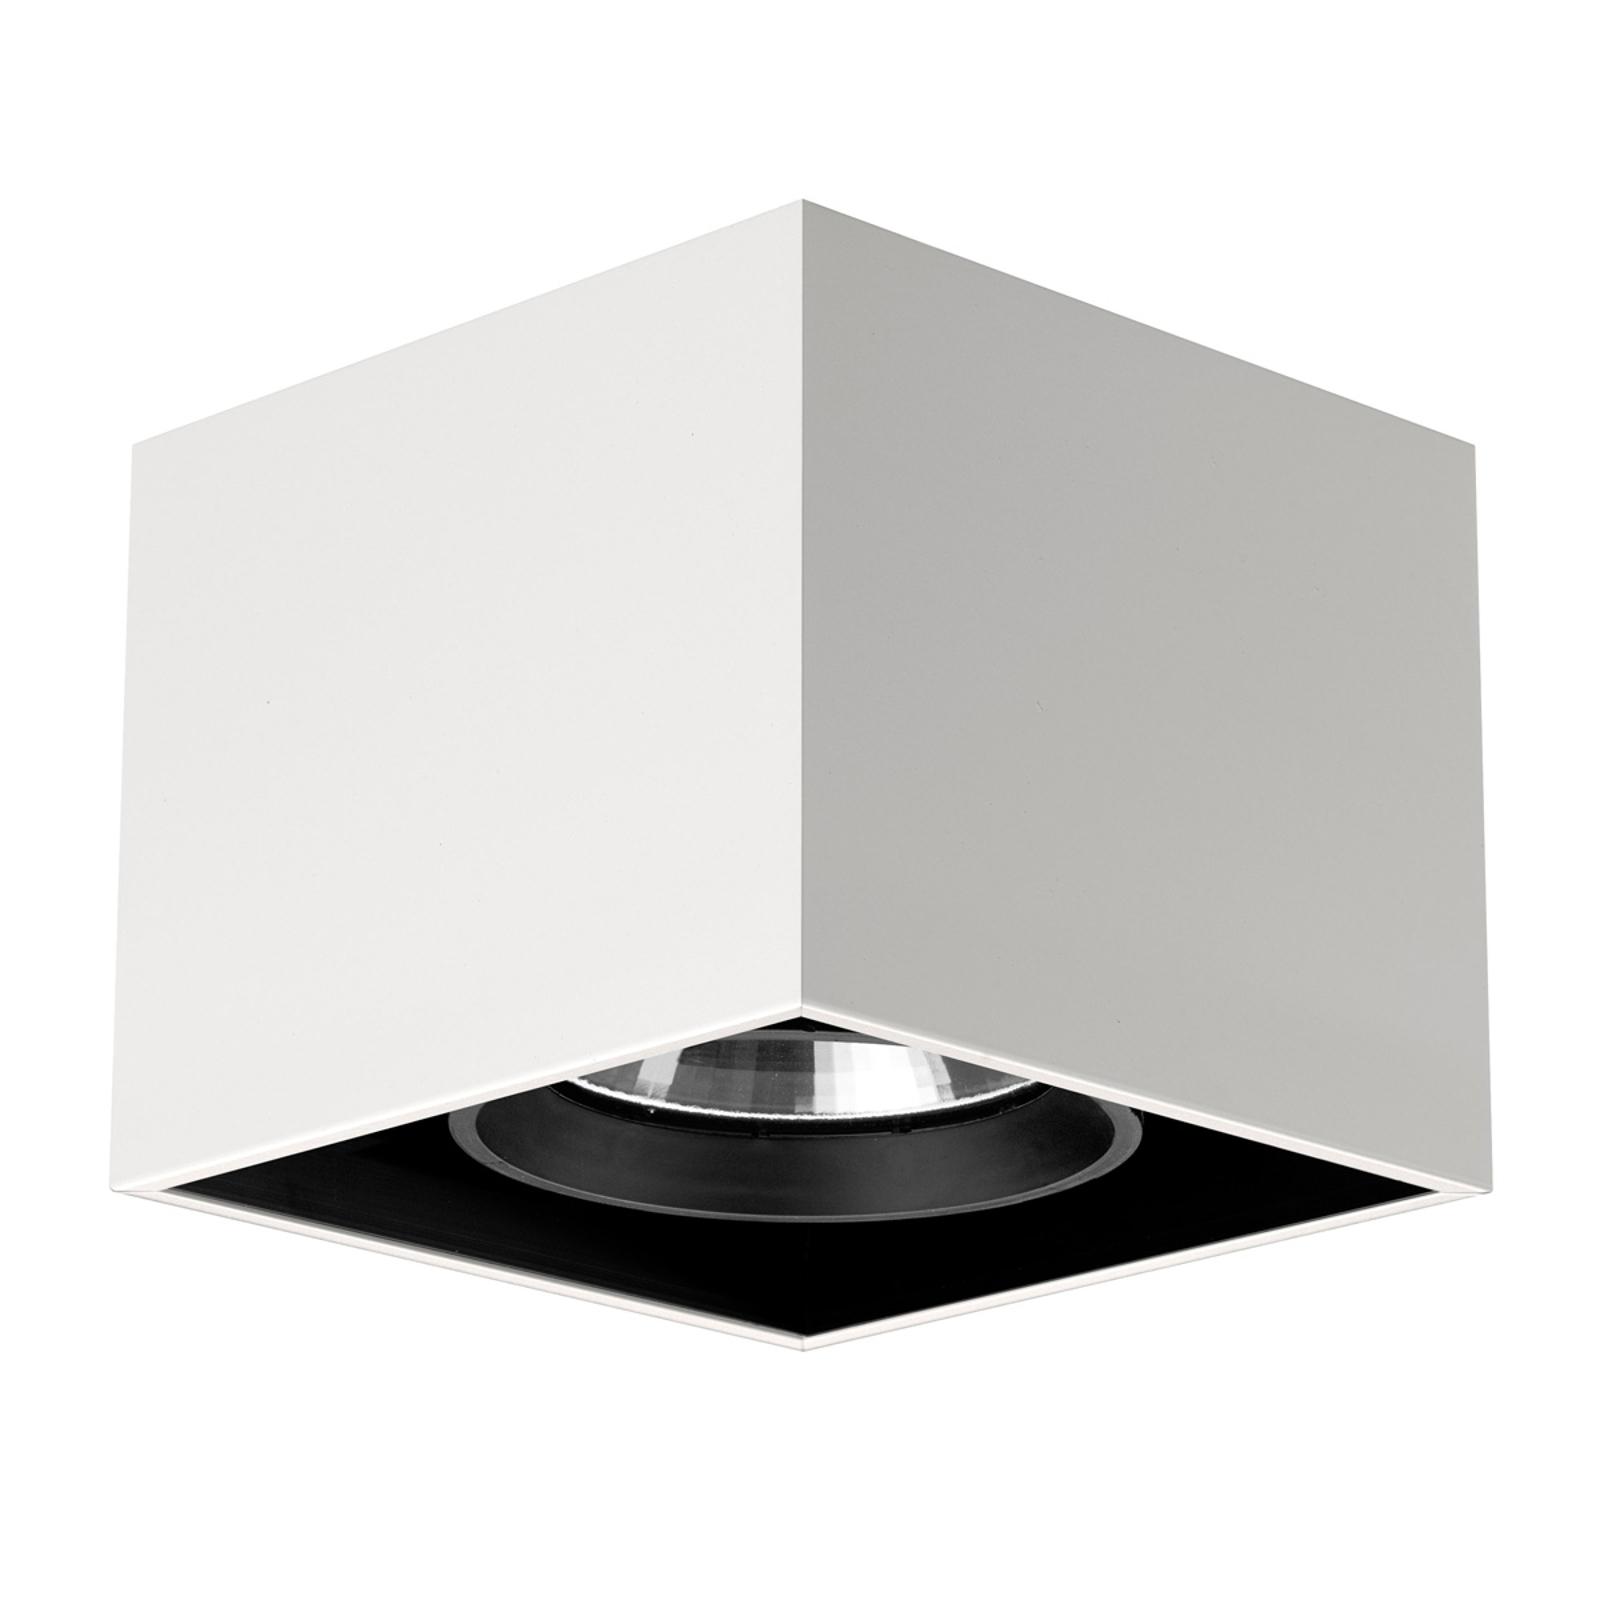 Hvit Compass Box - kvadratisk taklampe